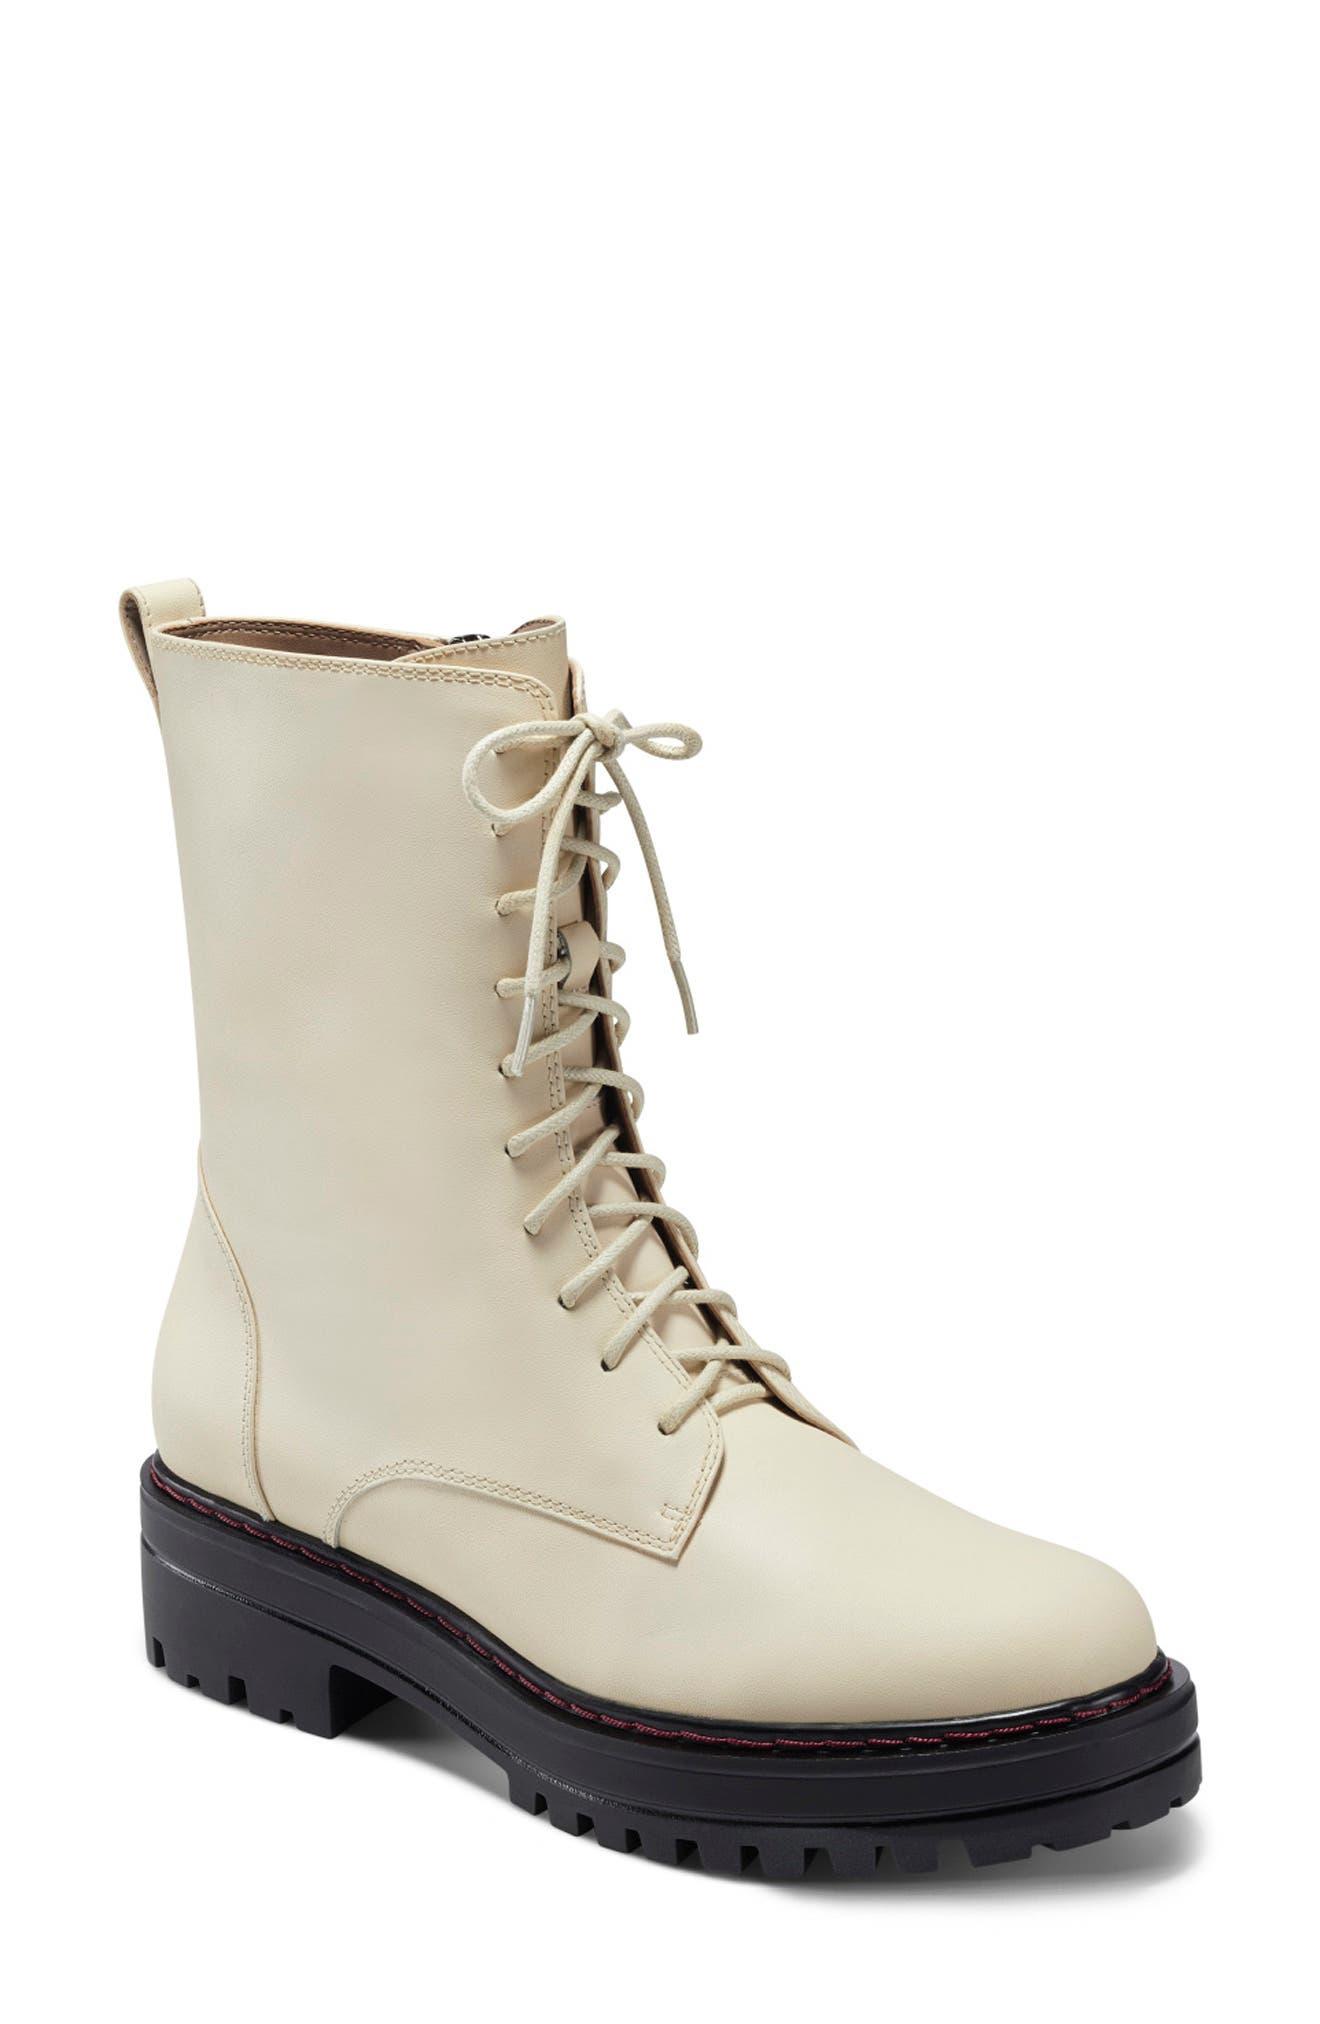 Shelton Combat Boot